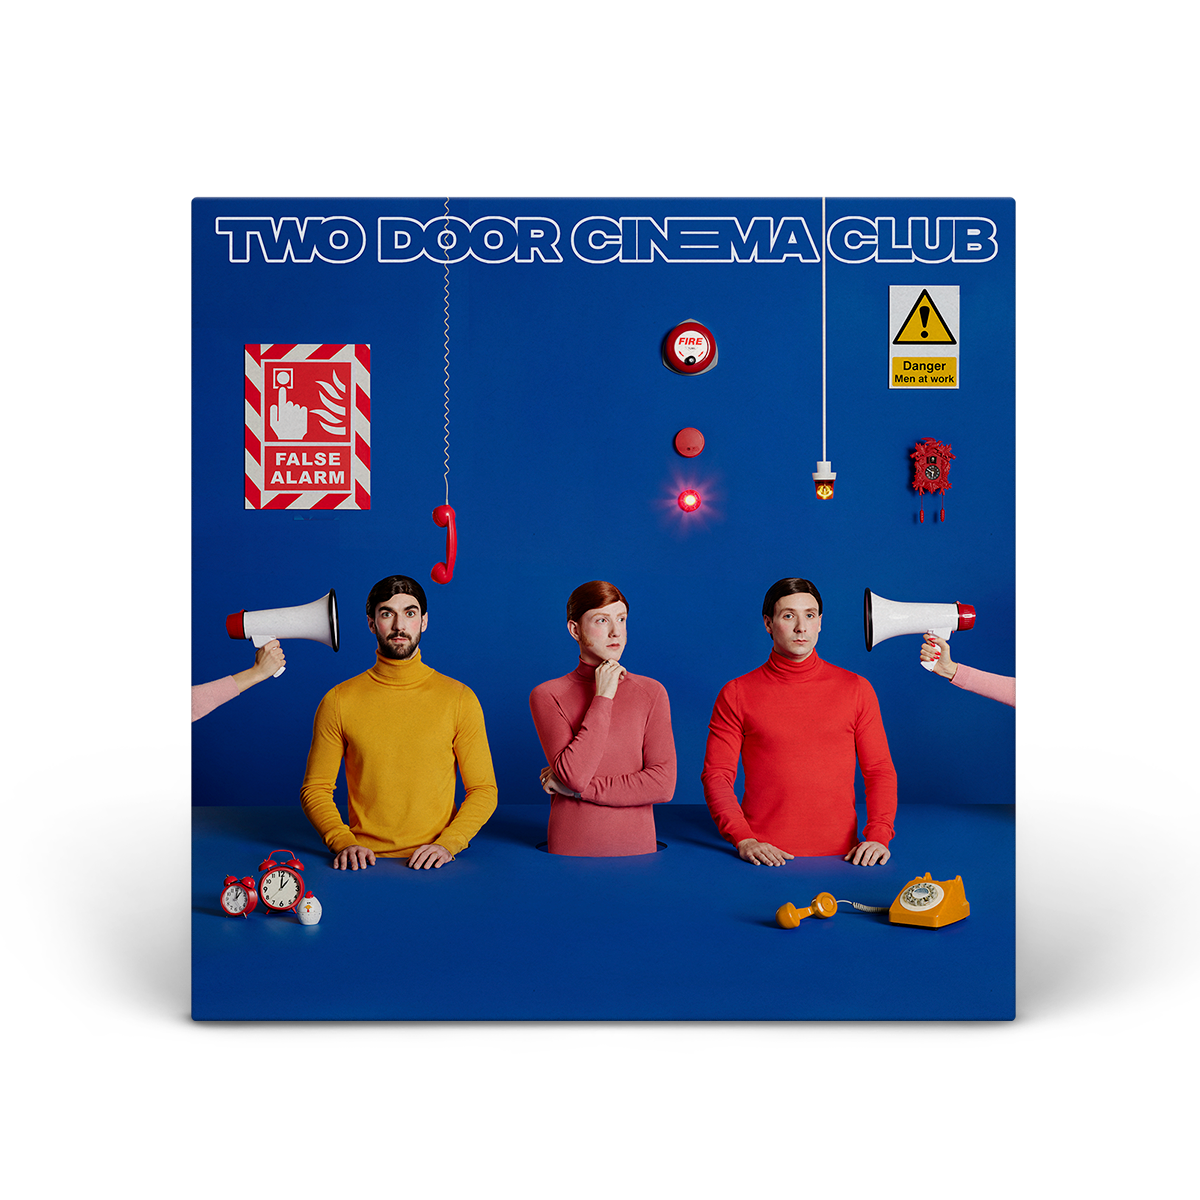 "Two Door Cinema Club - False Alarm 12"" x 12"" Print"